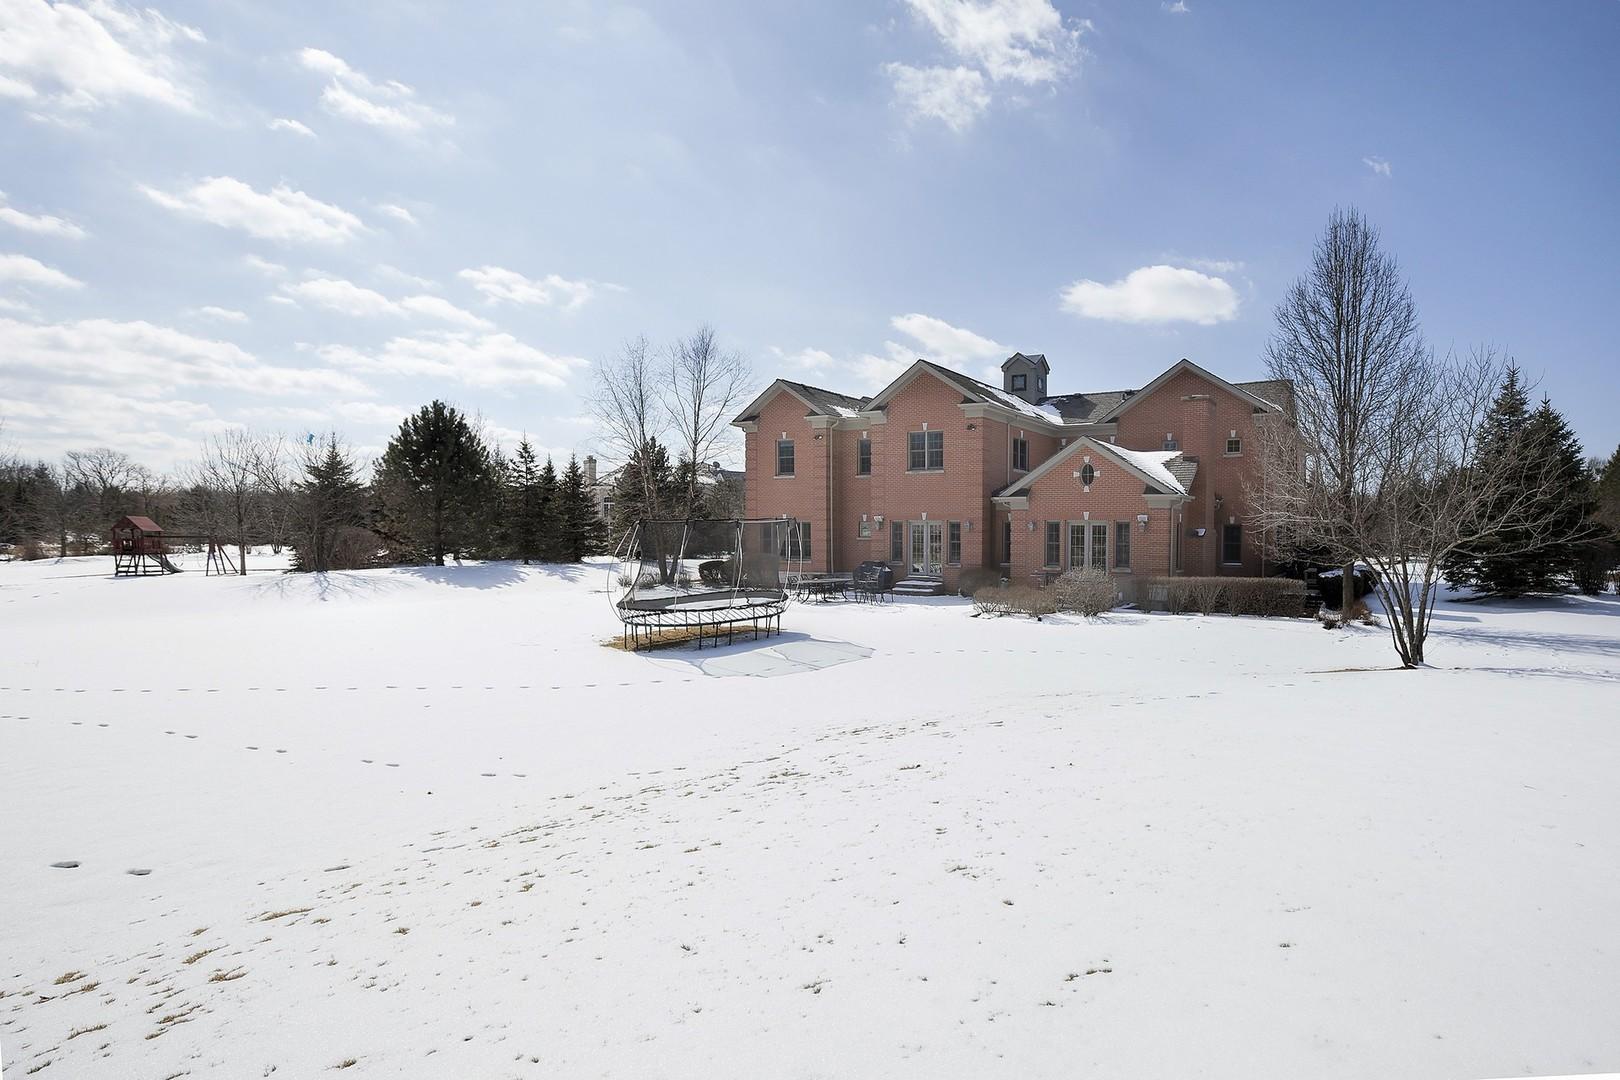 11 Broadleys, BANNOCKBURN, Illinois, 60015